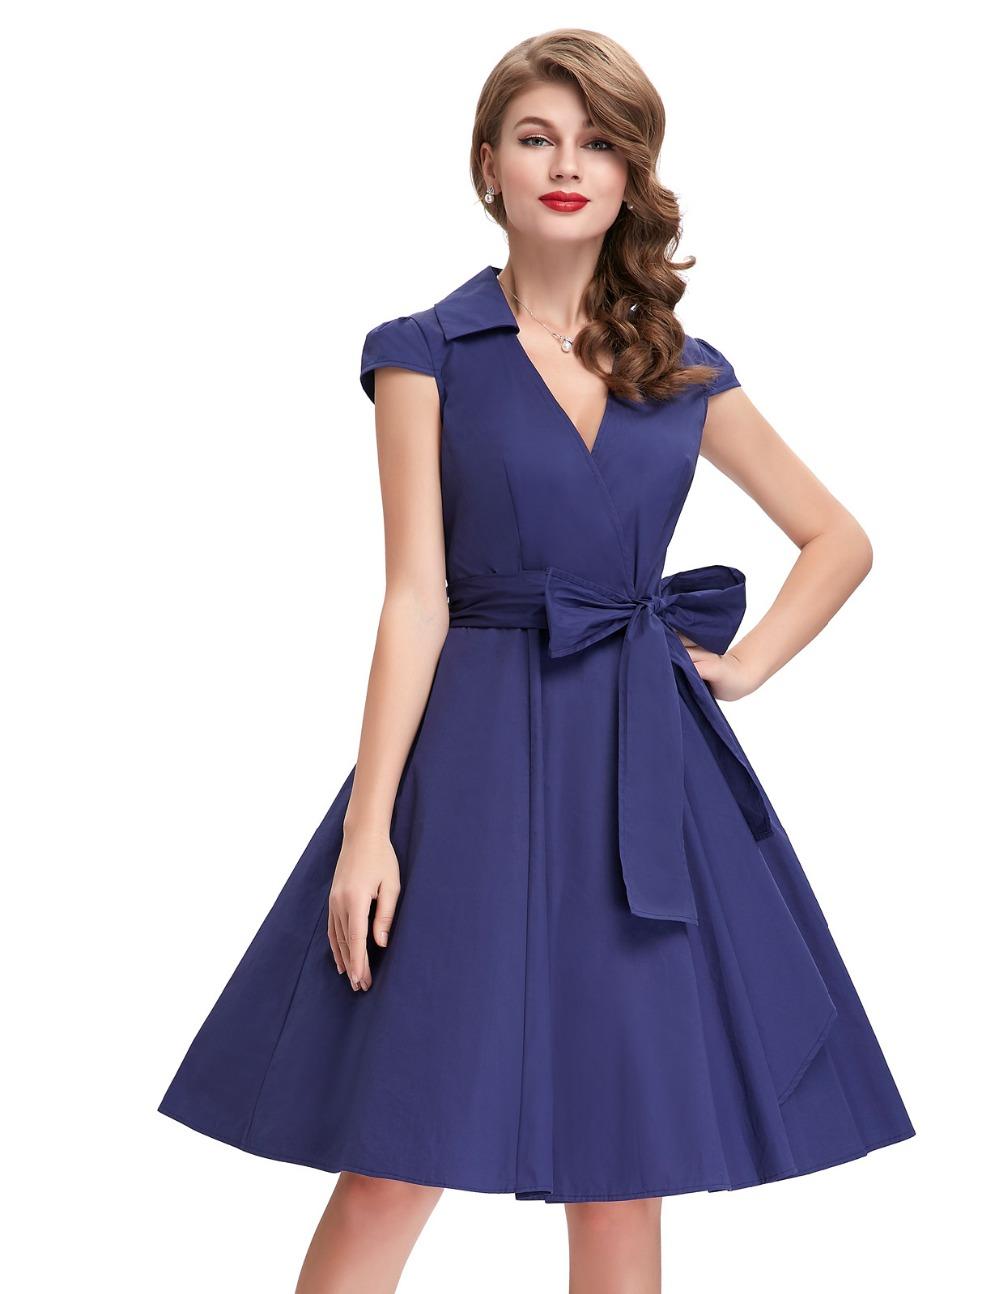 Consider, that vintage 50 s dresses